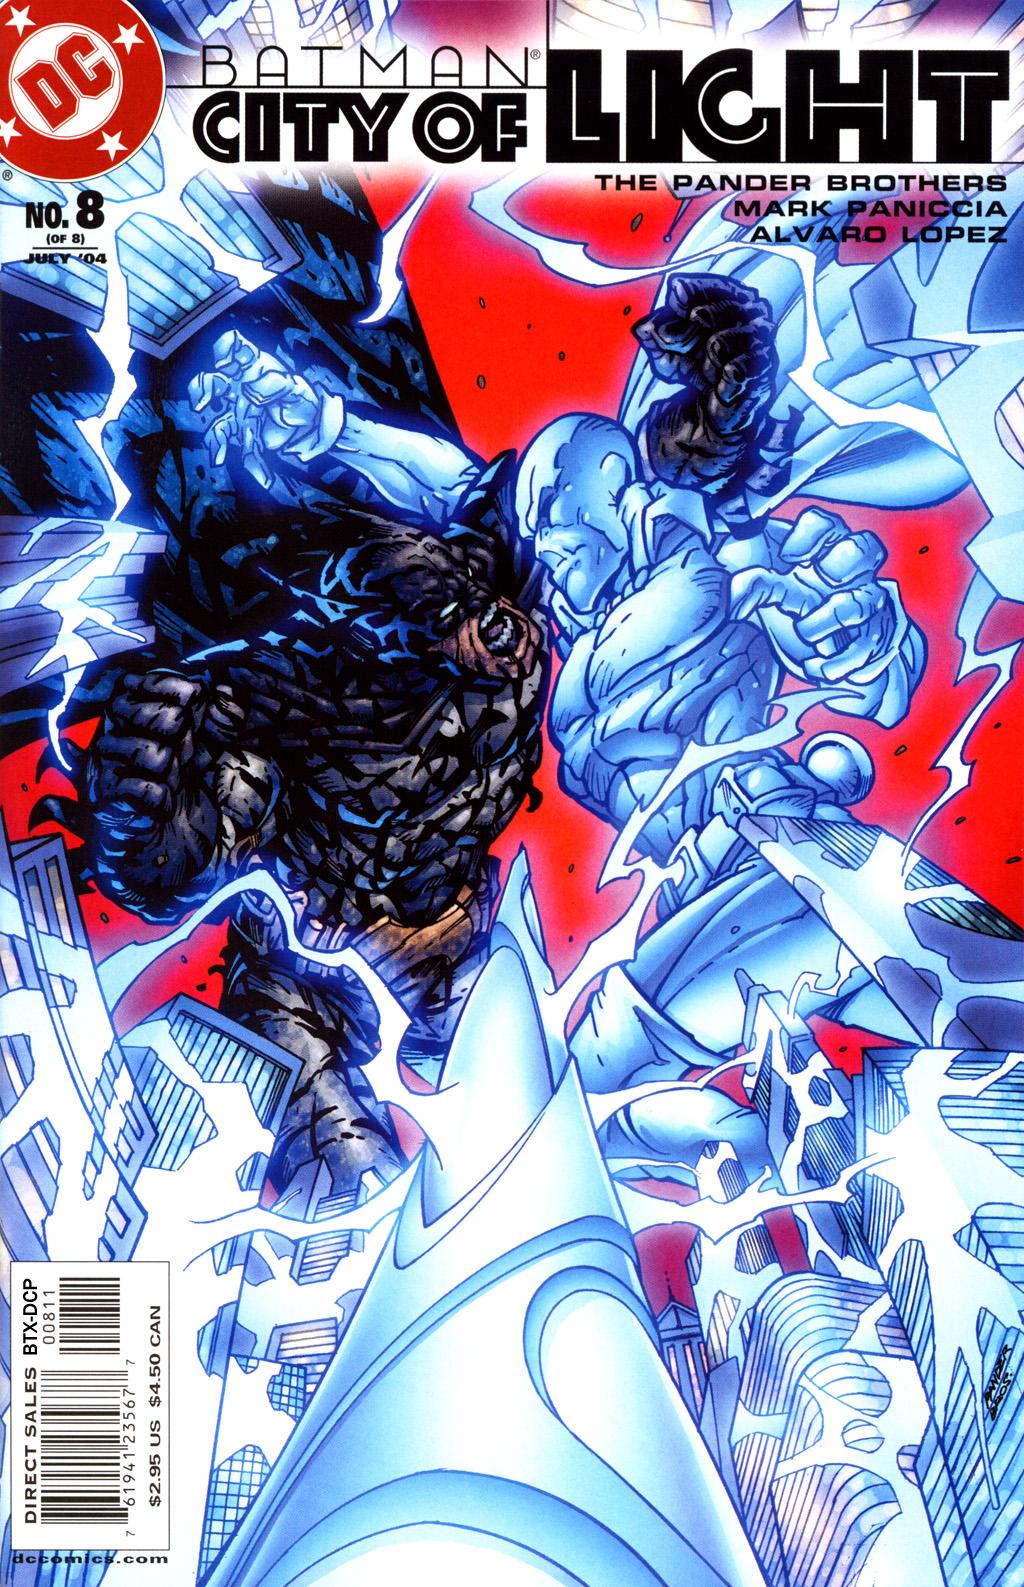 Batman: City of Light 8 Page 1